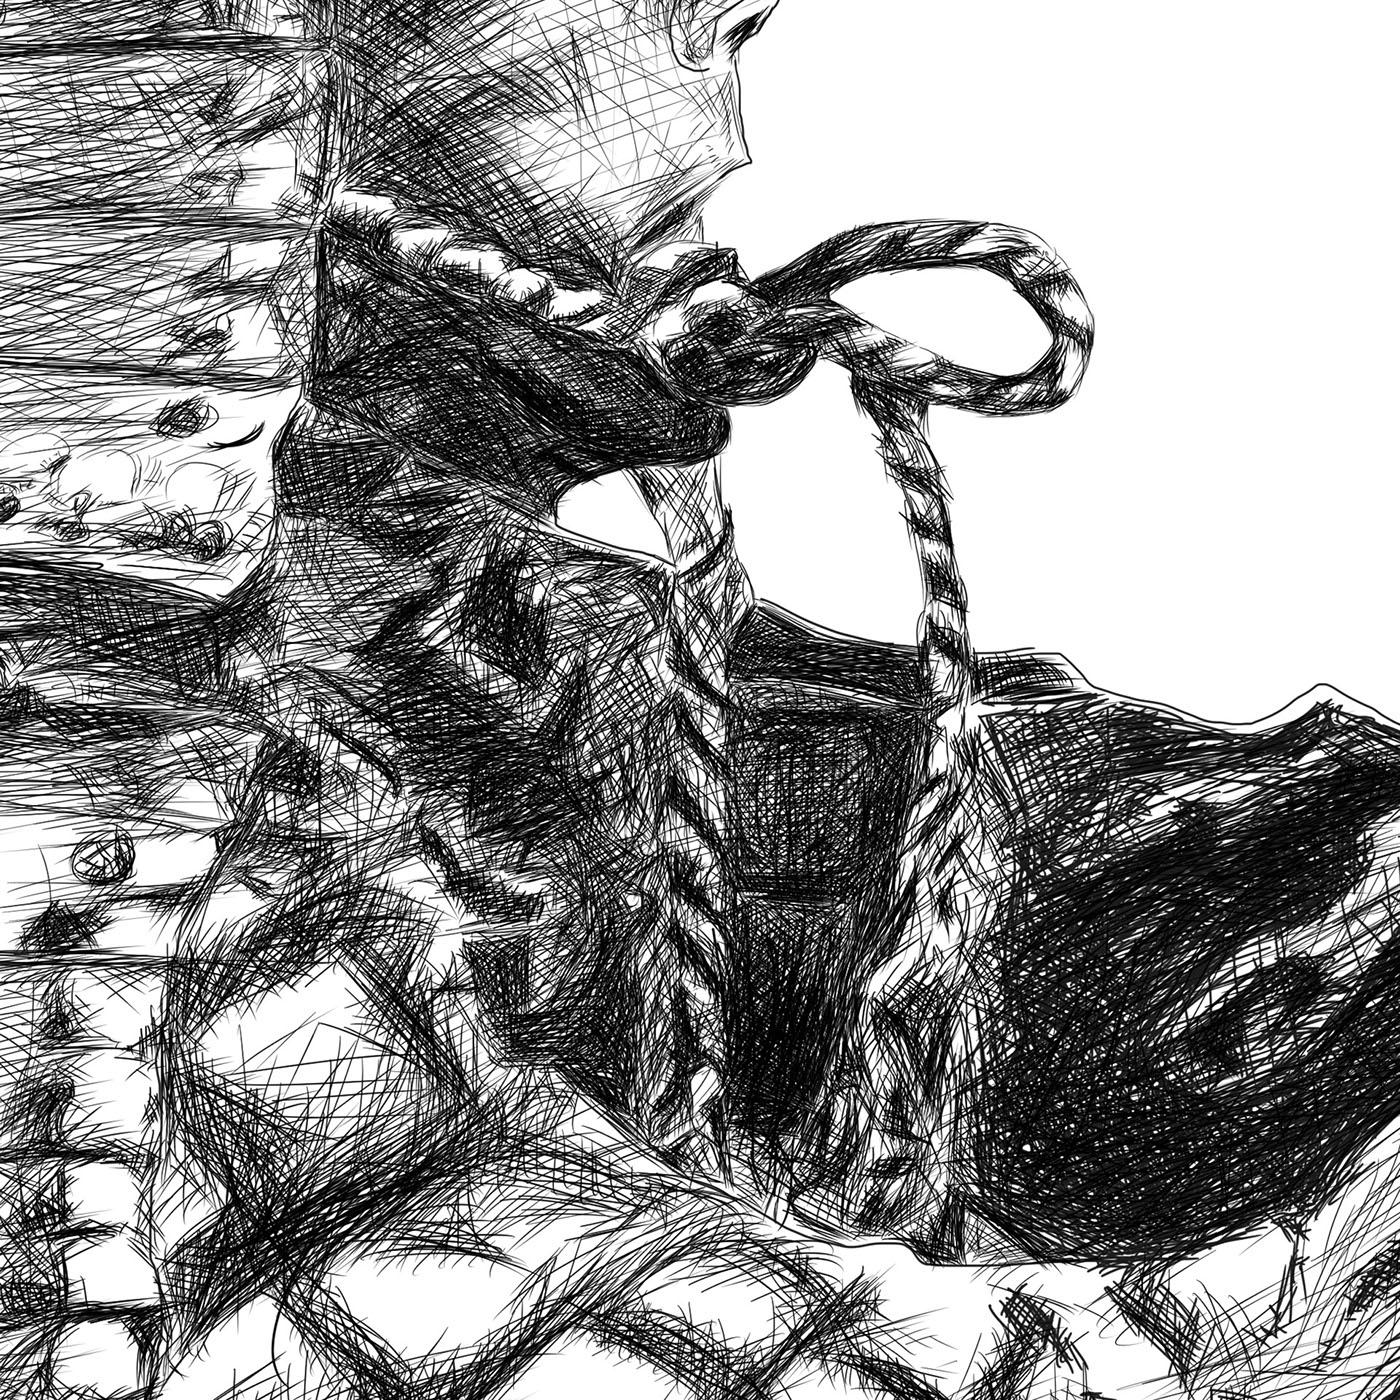 Samurai line drawing digital pencil ציור קווי סמוראי עיפרון דיגיטלי closeup3